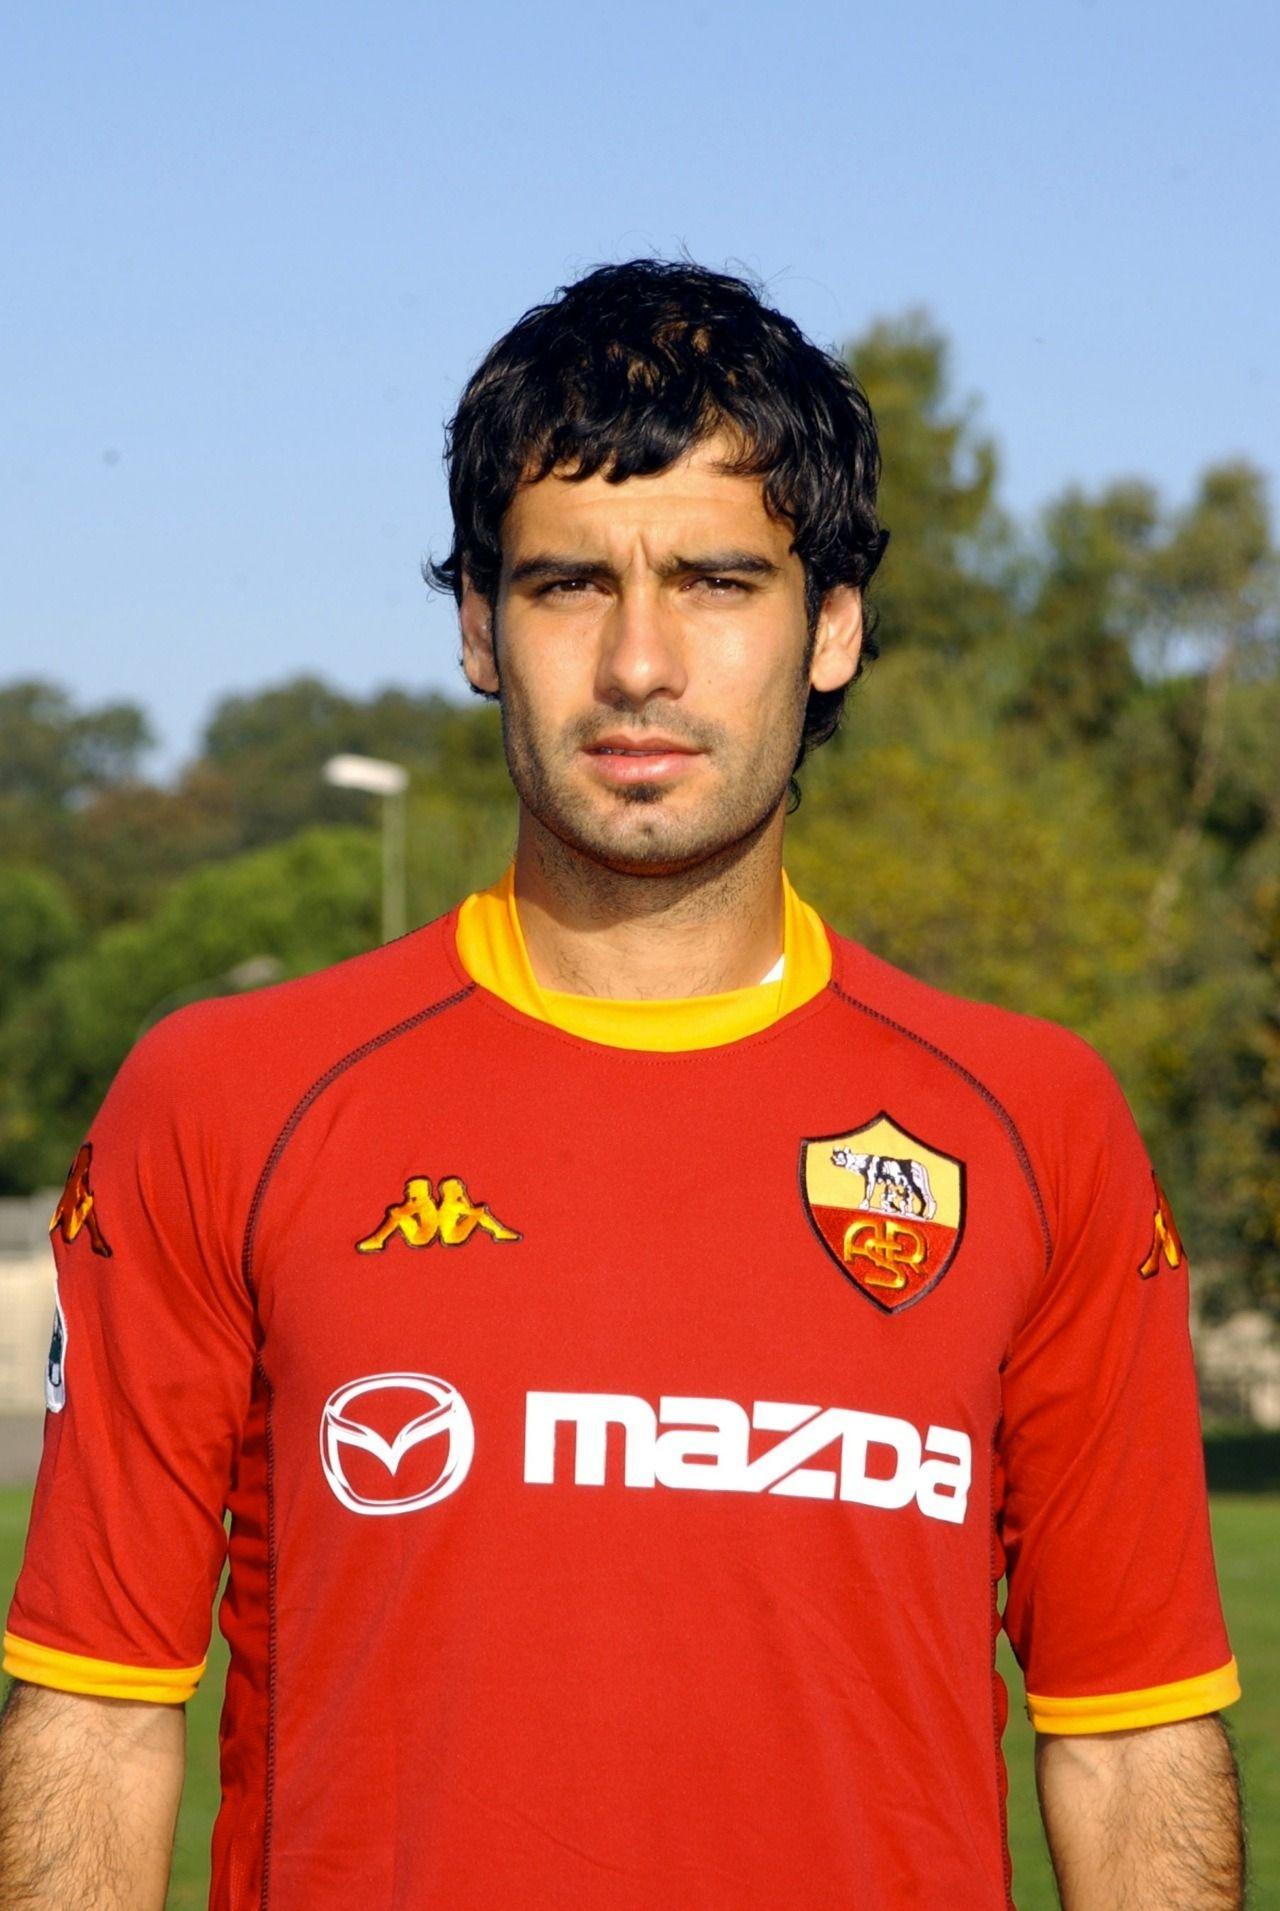 PEP GUARDIOLA AS ROMA   Fútbol de barcelona, Leyendas de futbol, Futbol  español